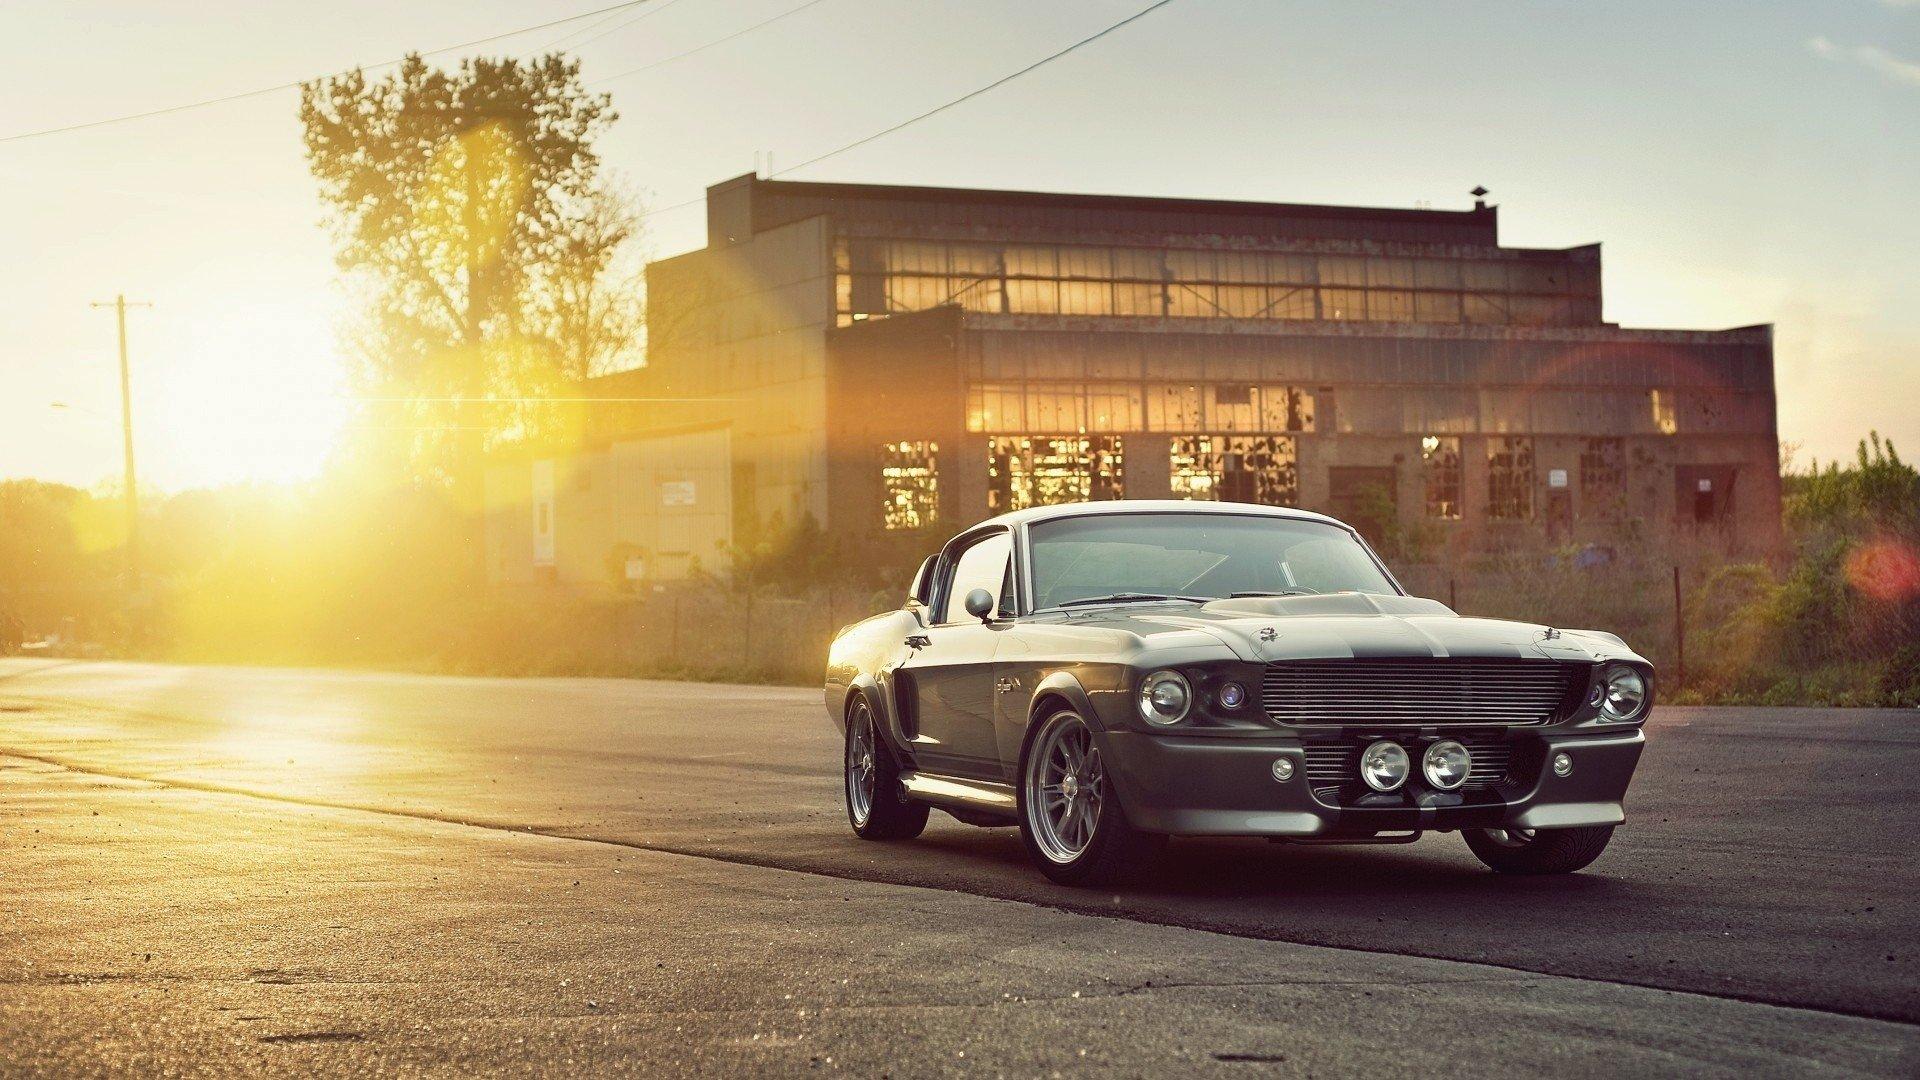 Ford Mustang 1967 Hd Wallpaper 1920X1080